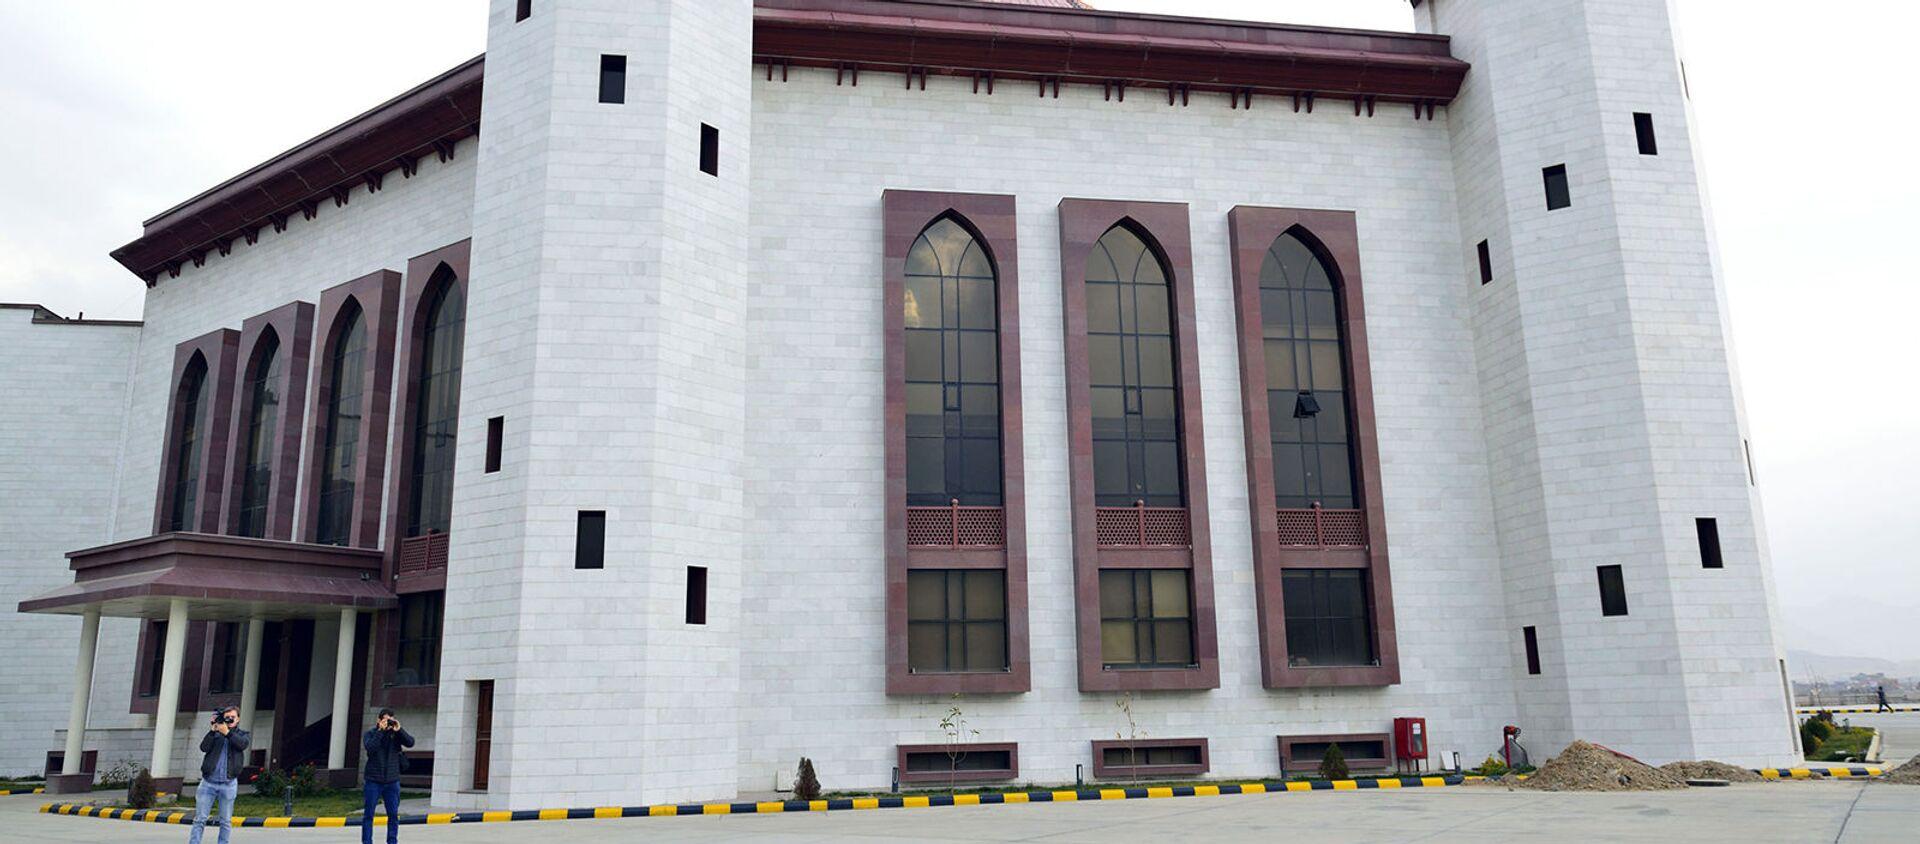 Здание Парламента Афганистана, Кабул - Sputnik Արմենիա, 1920, 19.08.2021